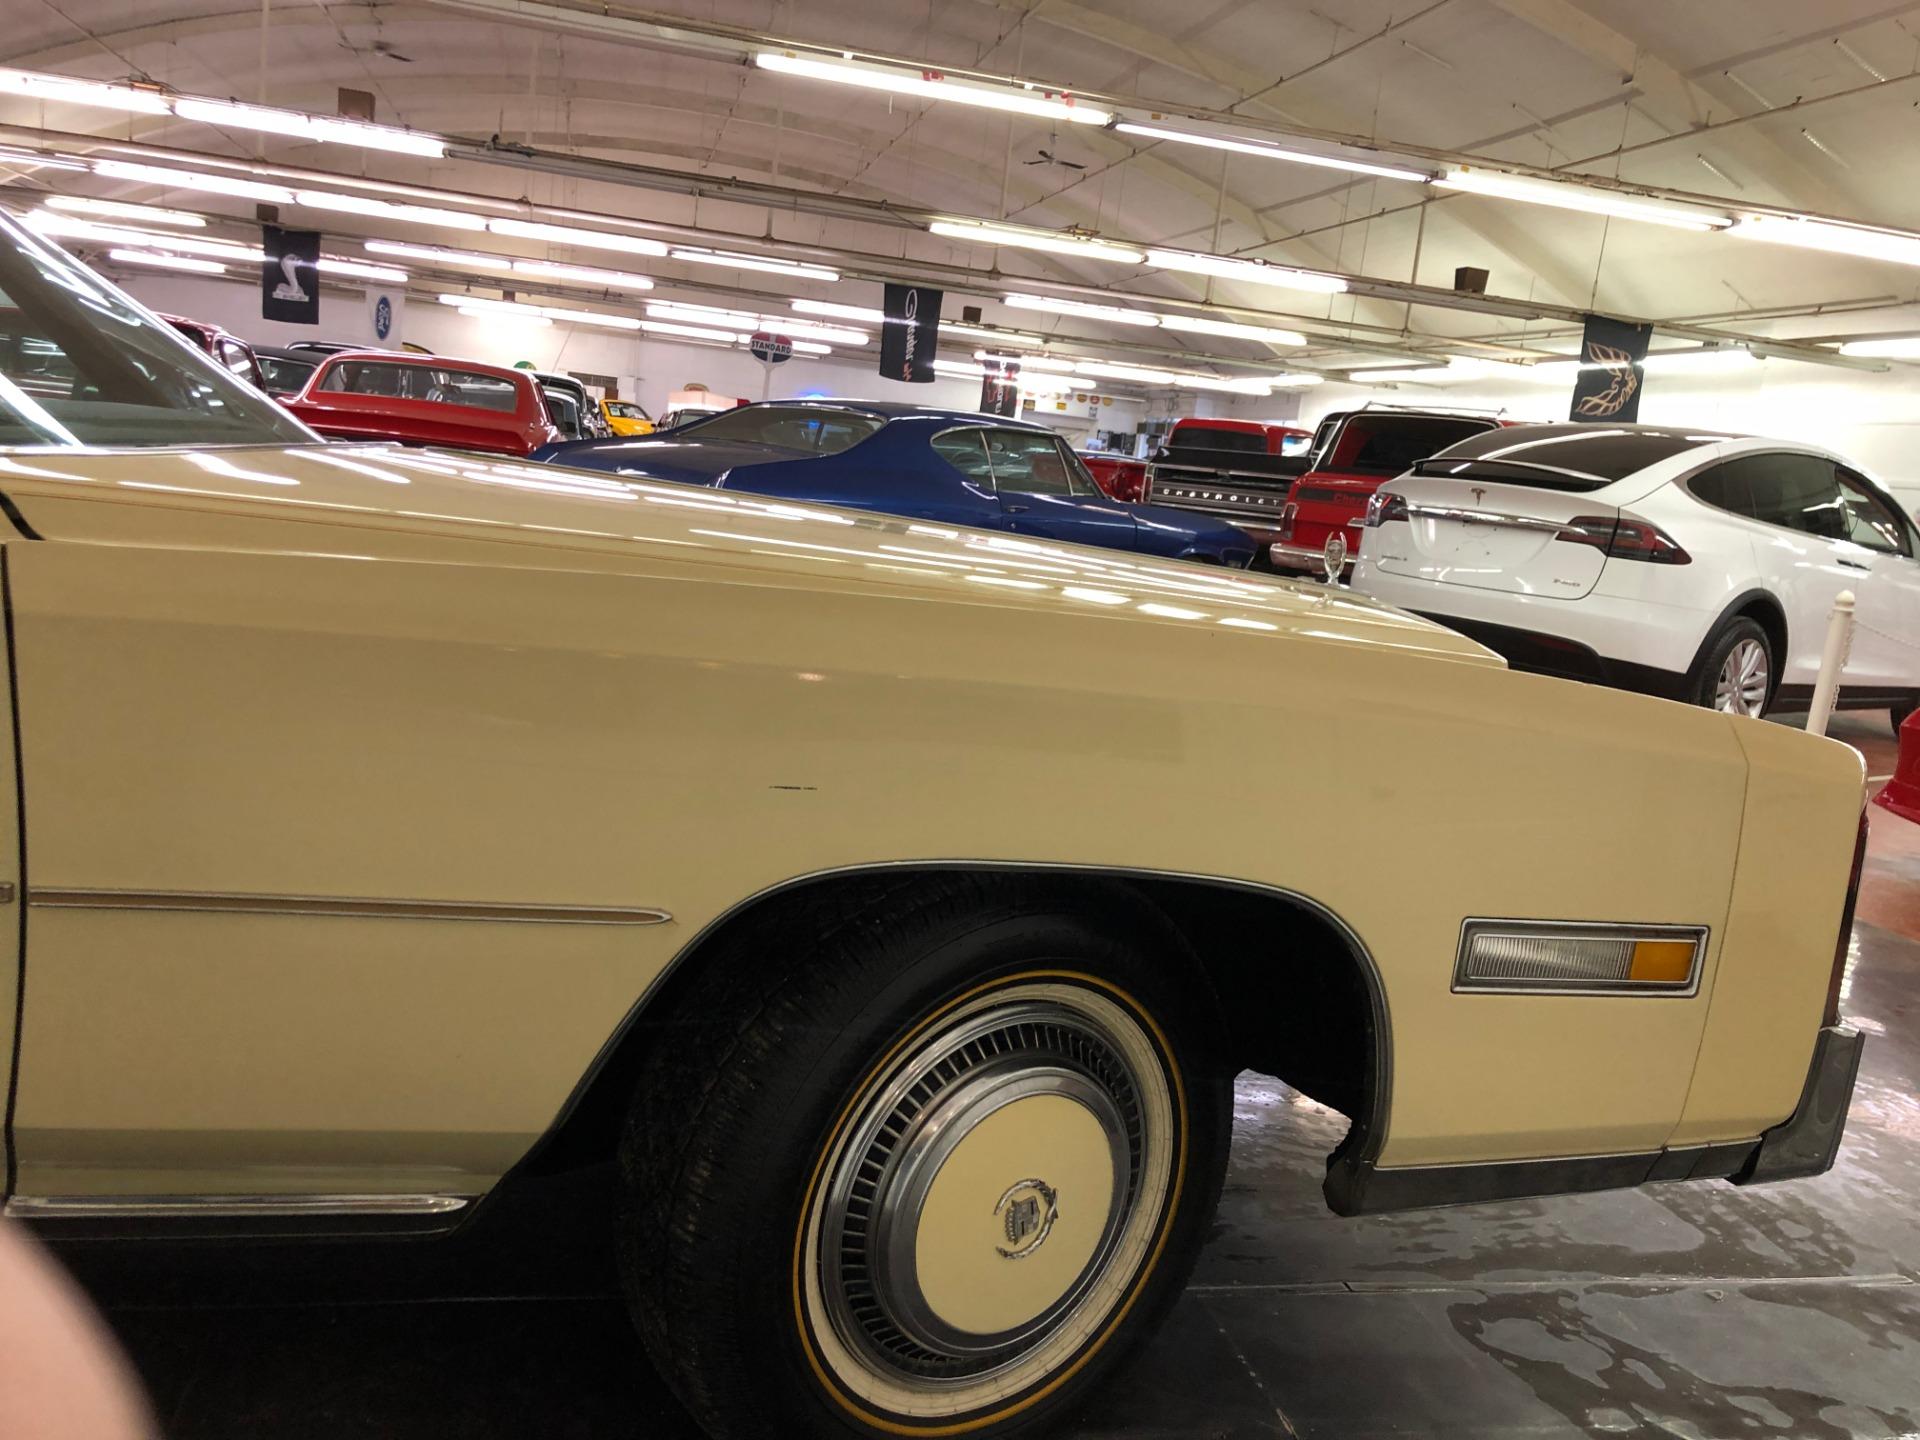 Used 1976 Cadillac Eldorado -500 CID-GREAT CLASSIC CONVERTIBLE-LOW MILES-VIDEO | Mundelein, IL